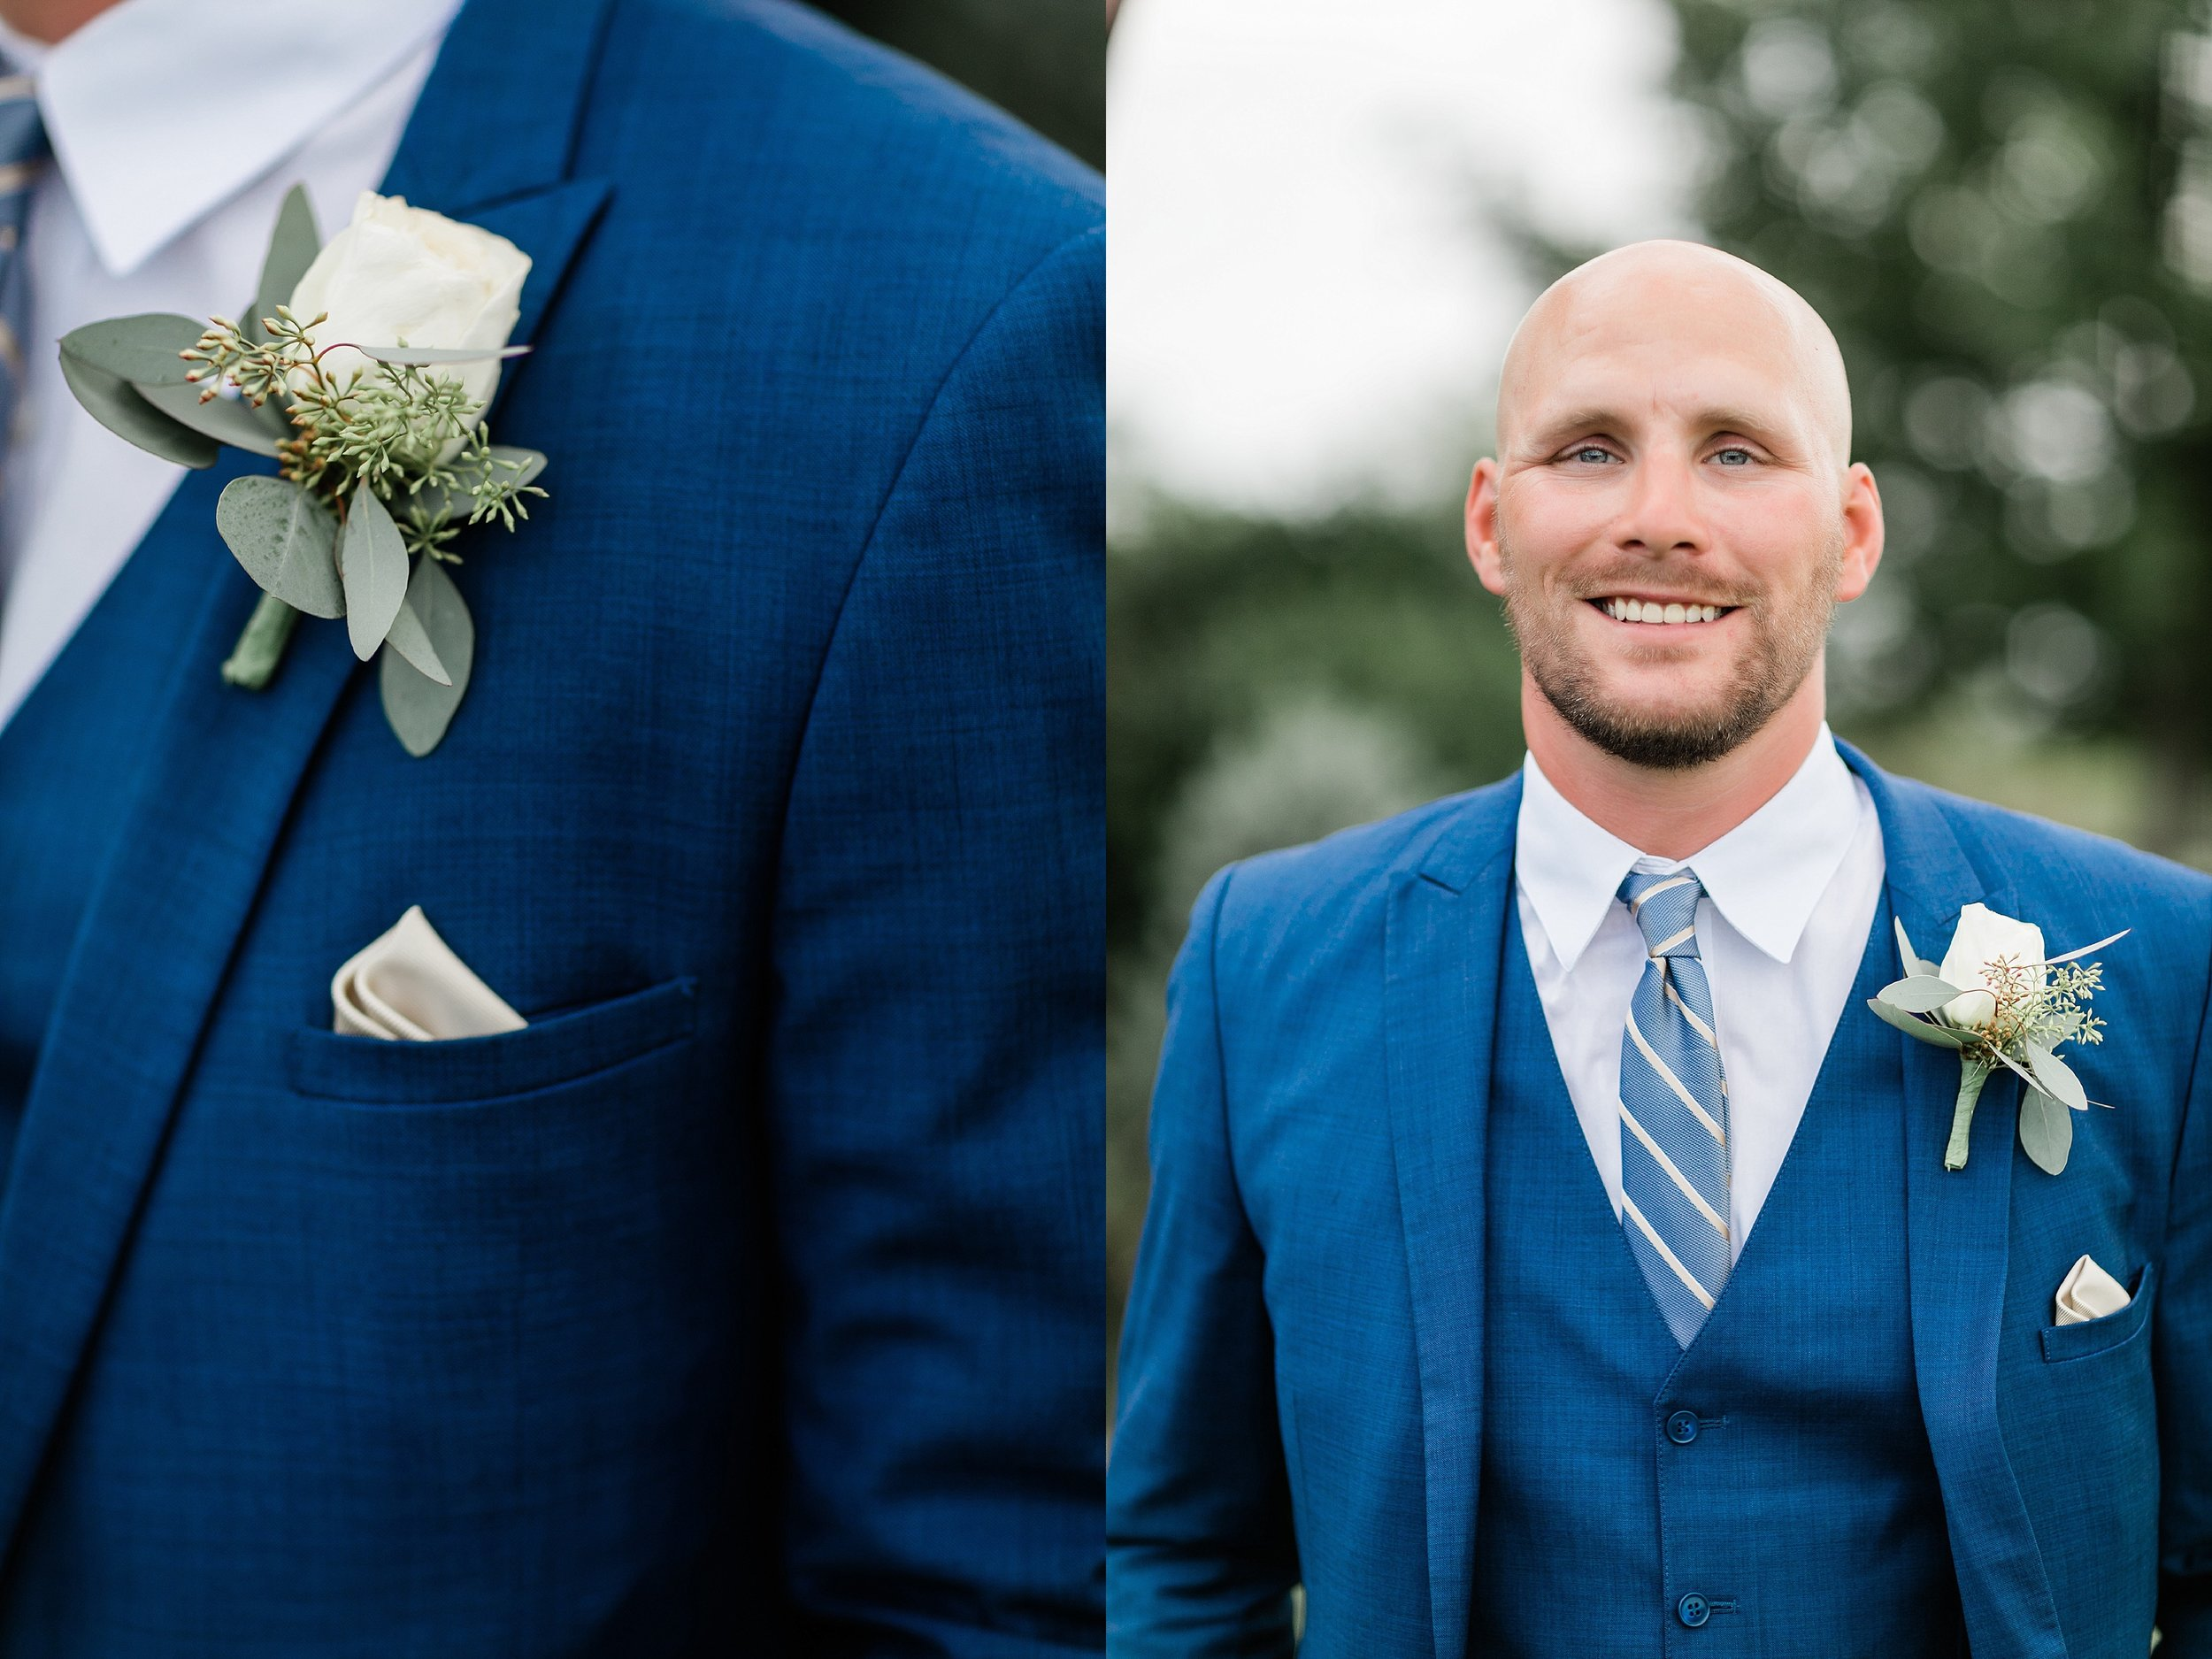 bailey-and-carl-coyote-ranch-resort-wedding-photographer-wichita-falls-texas-destination-wedding-0017.jpg